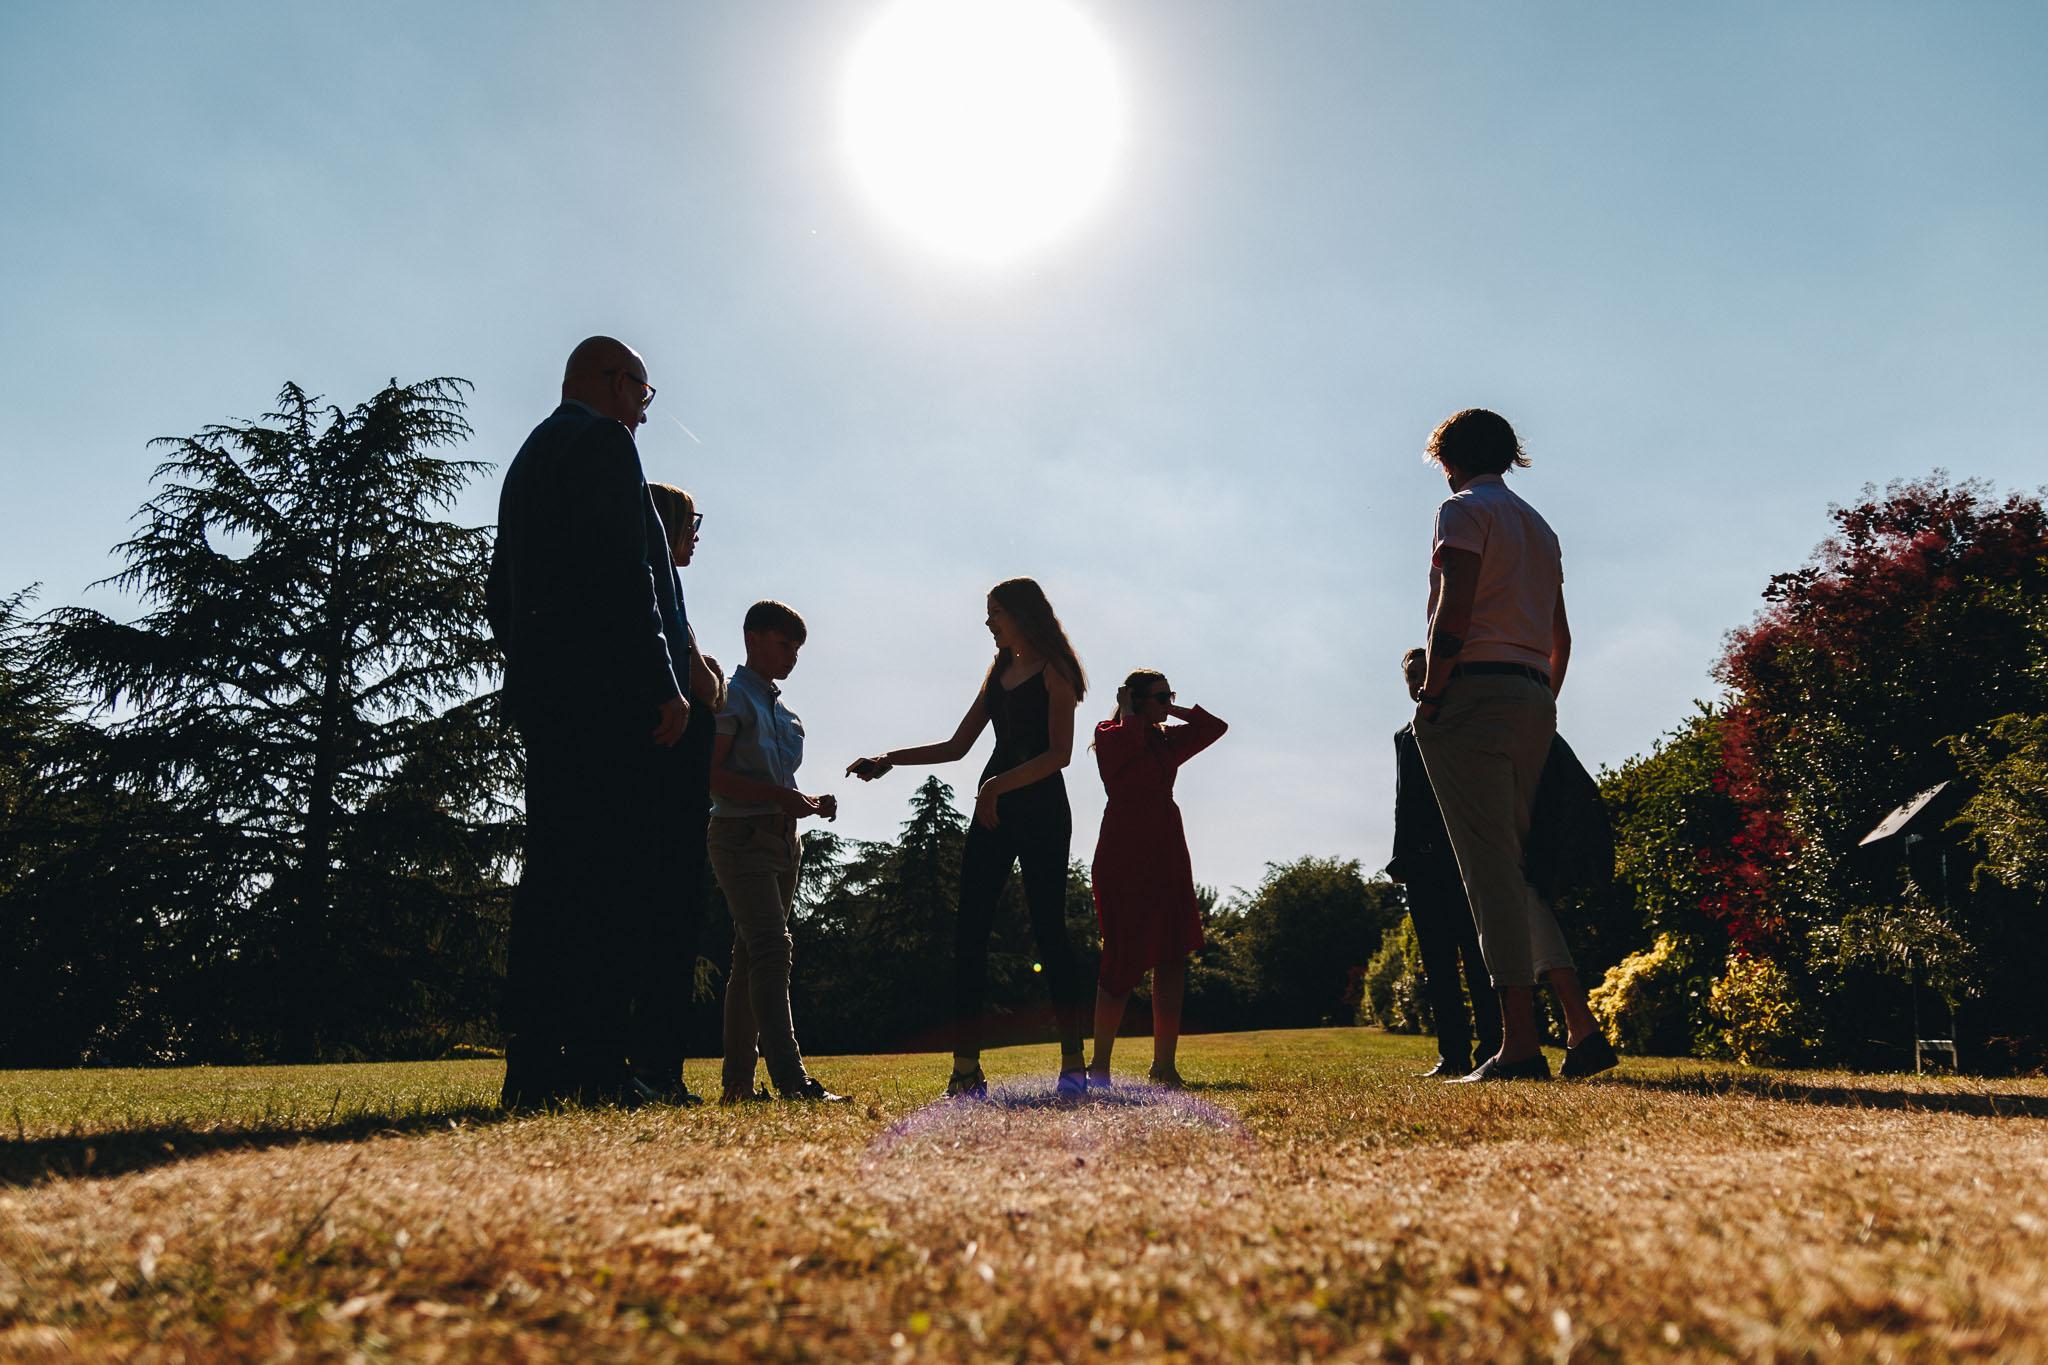 Yorkshire_sculpture_park_wedding_photography_130.jpg